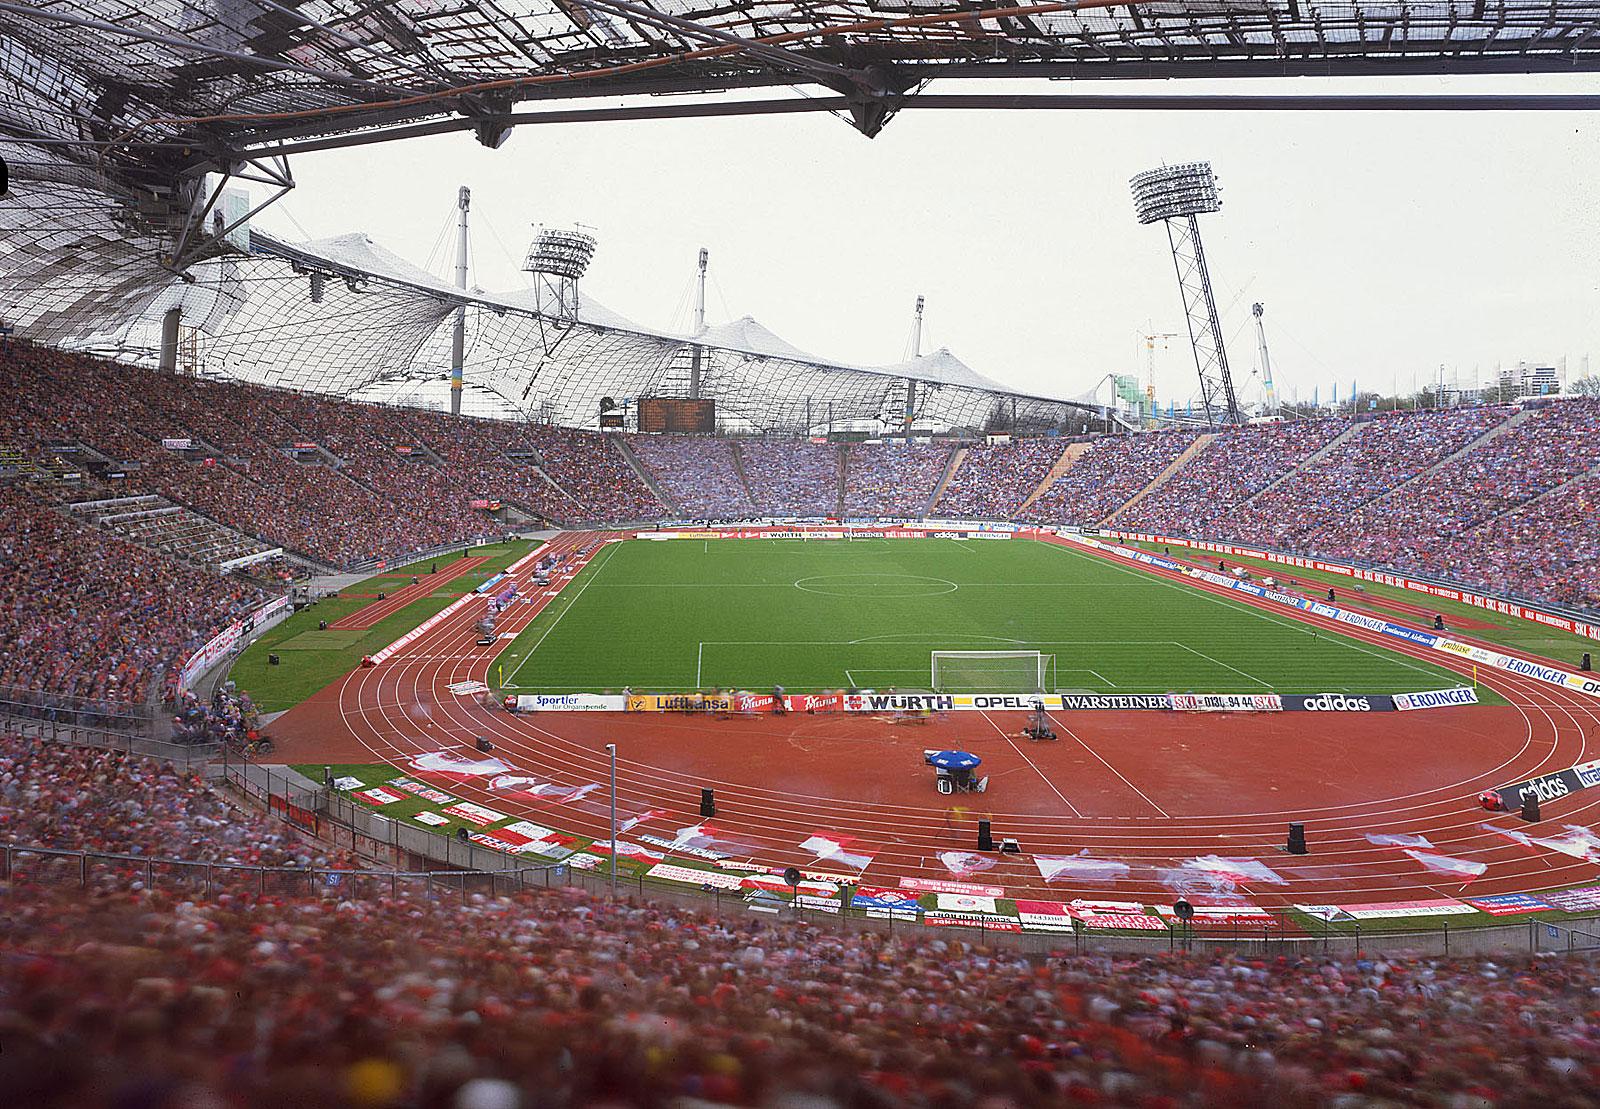 FC Bayern München – TSV 1860 München, Olympiastadion München (15.30 - 17.21 Uhr, 11.4.1998)